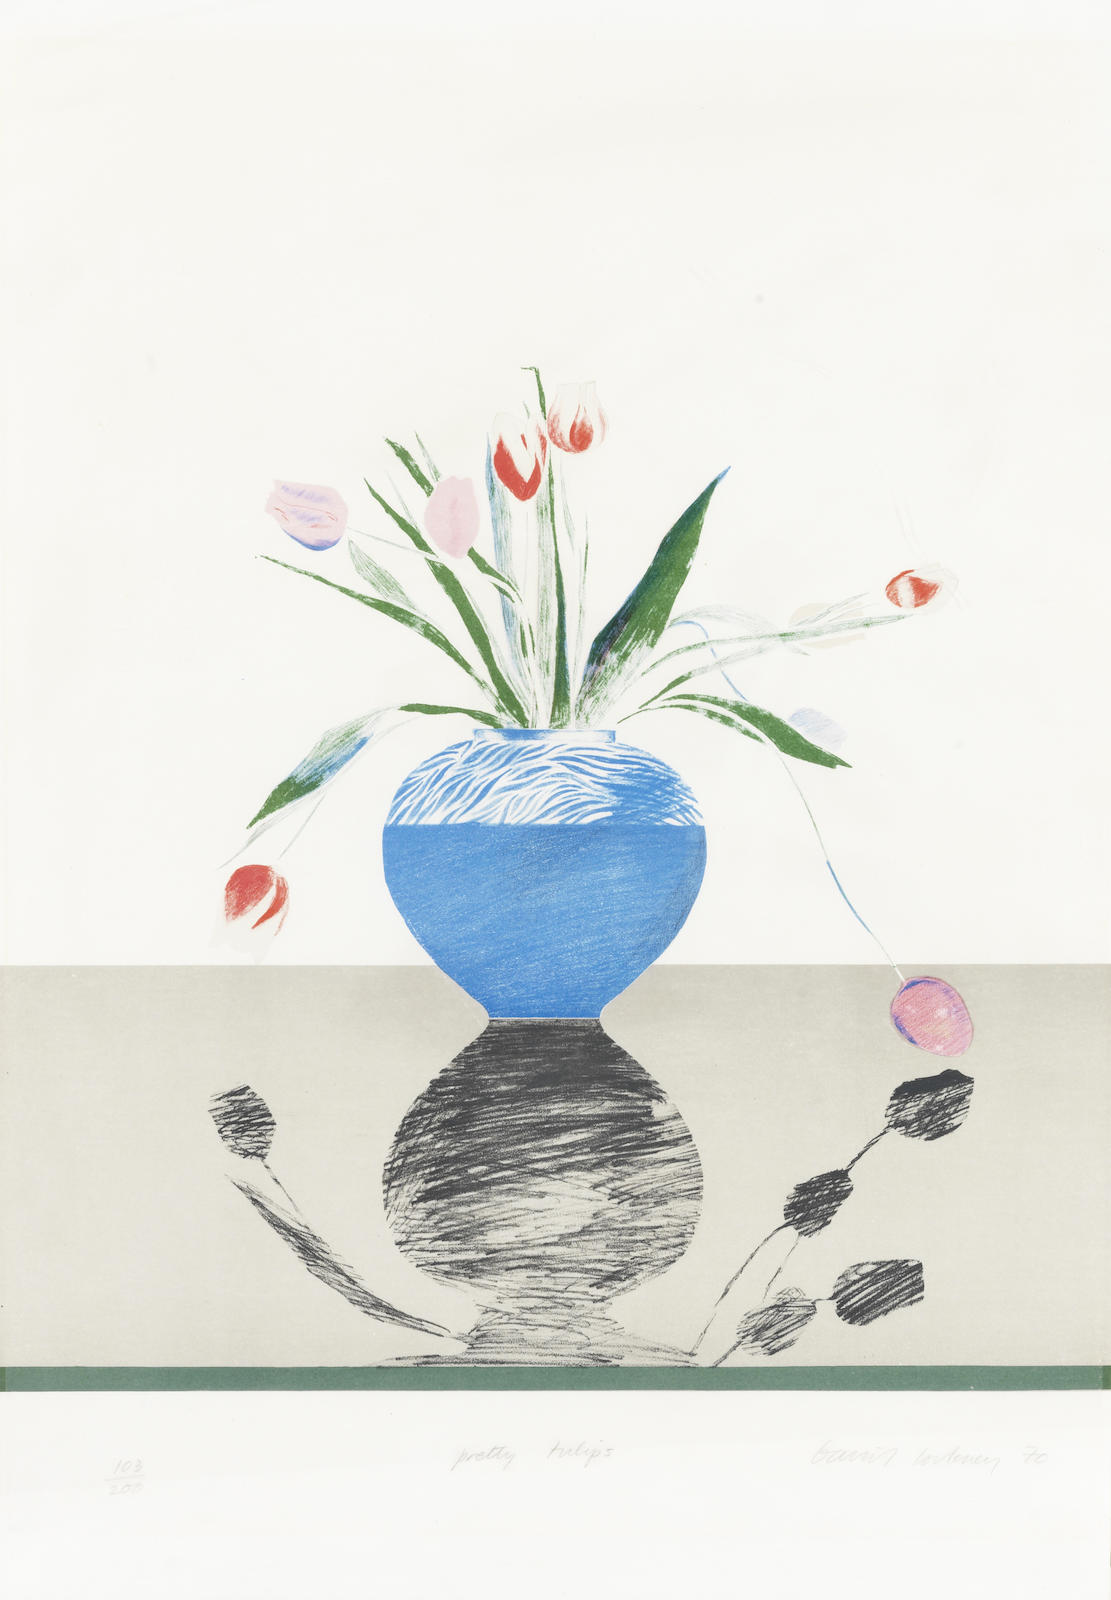 David Hockney-Pretty Tulips-1969